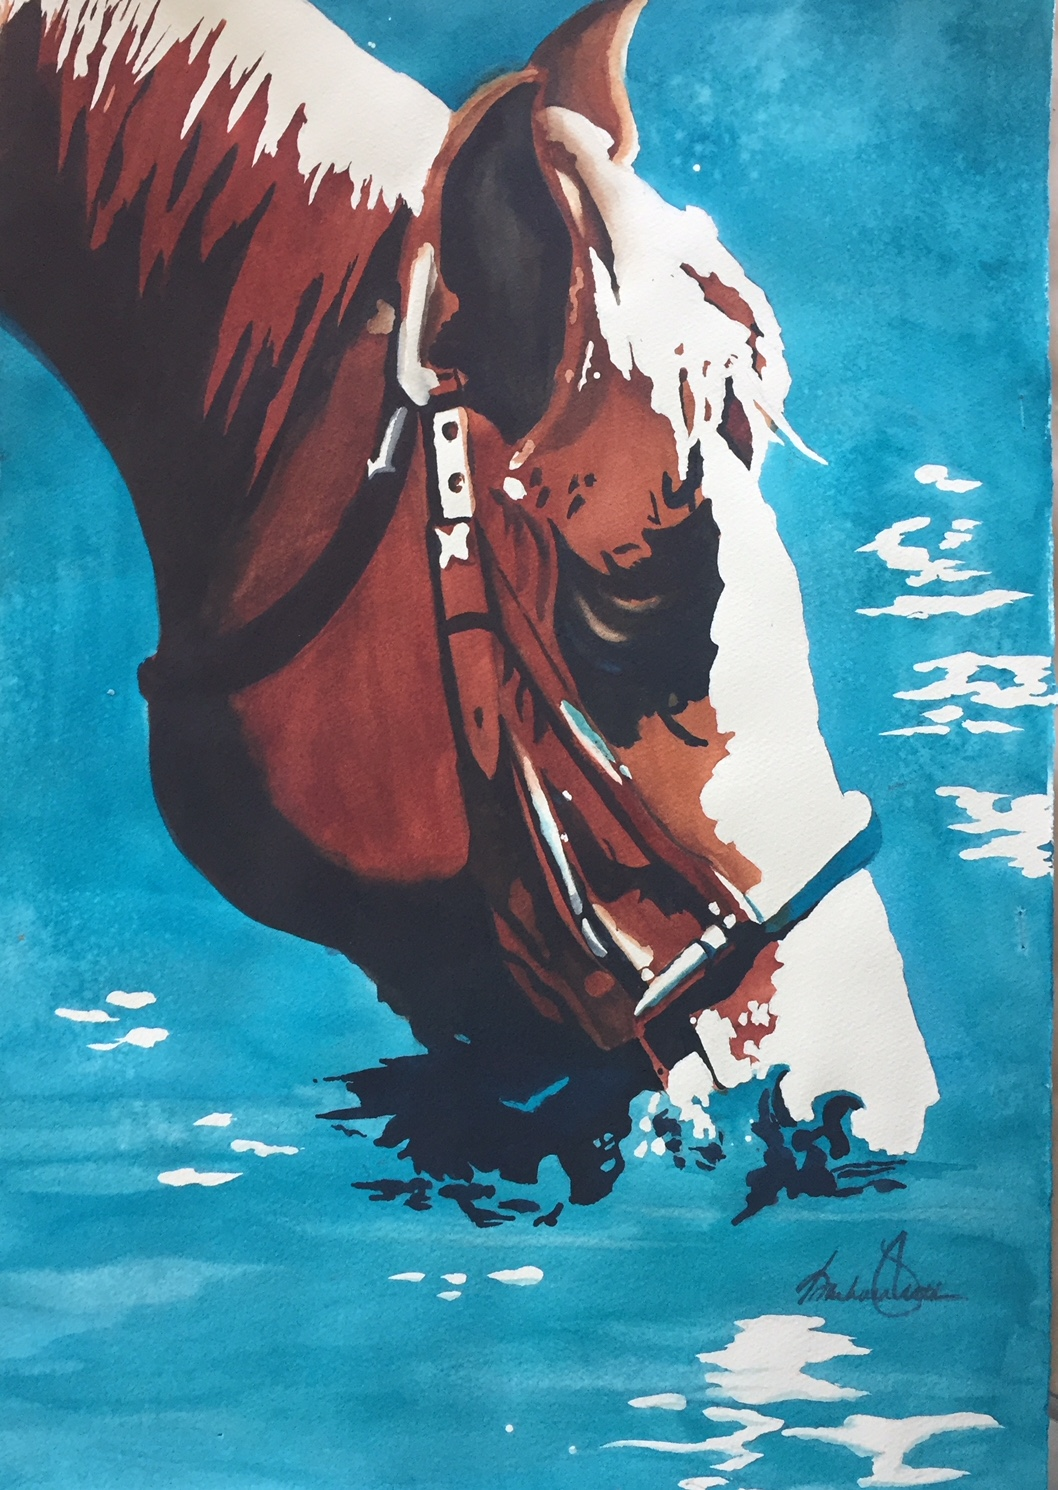 Barbara_Mathews_Horse.jpg